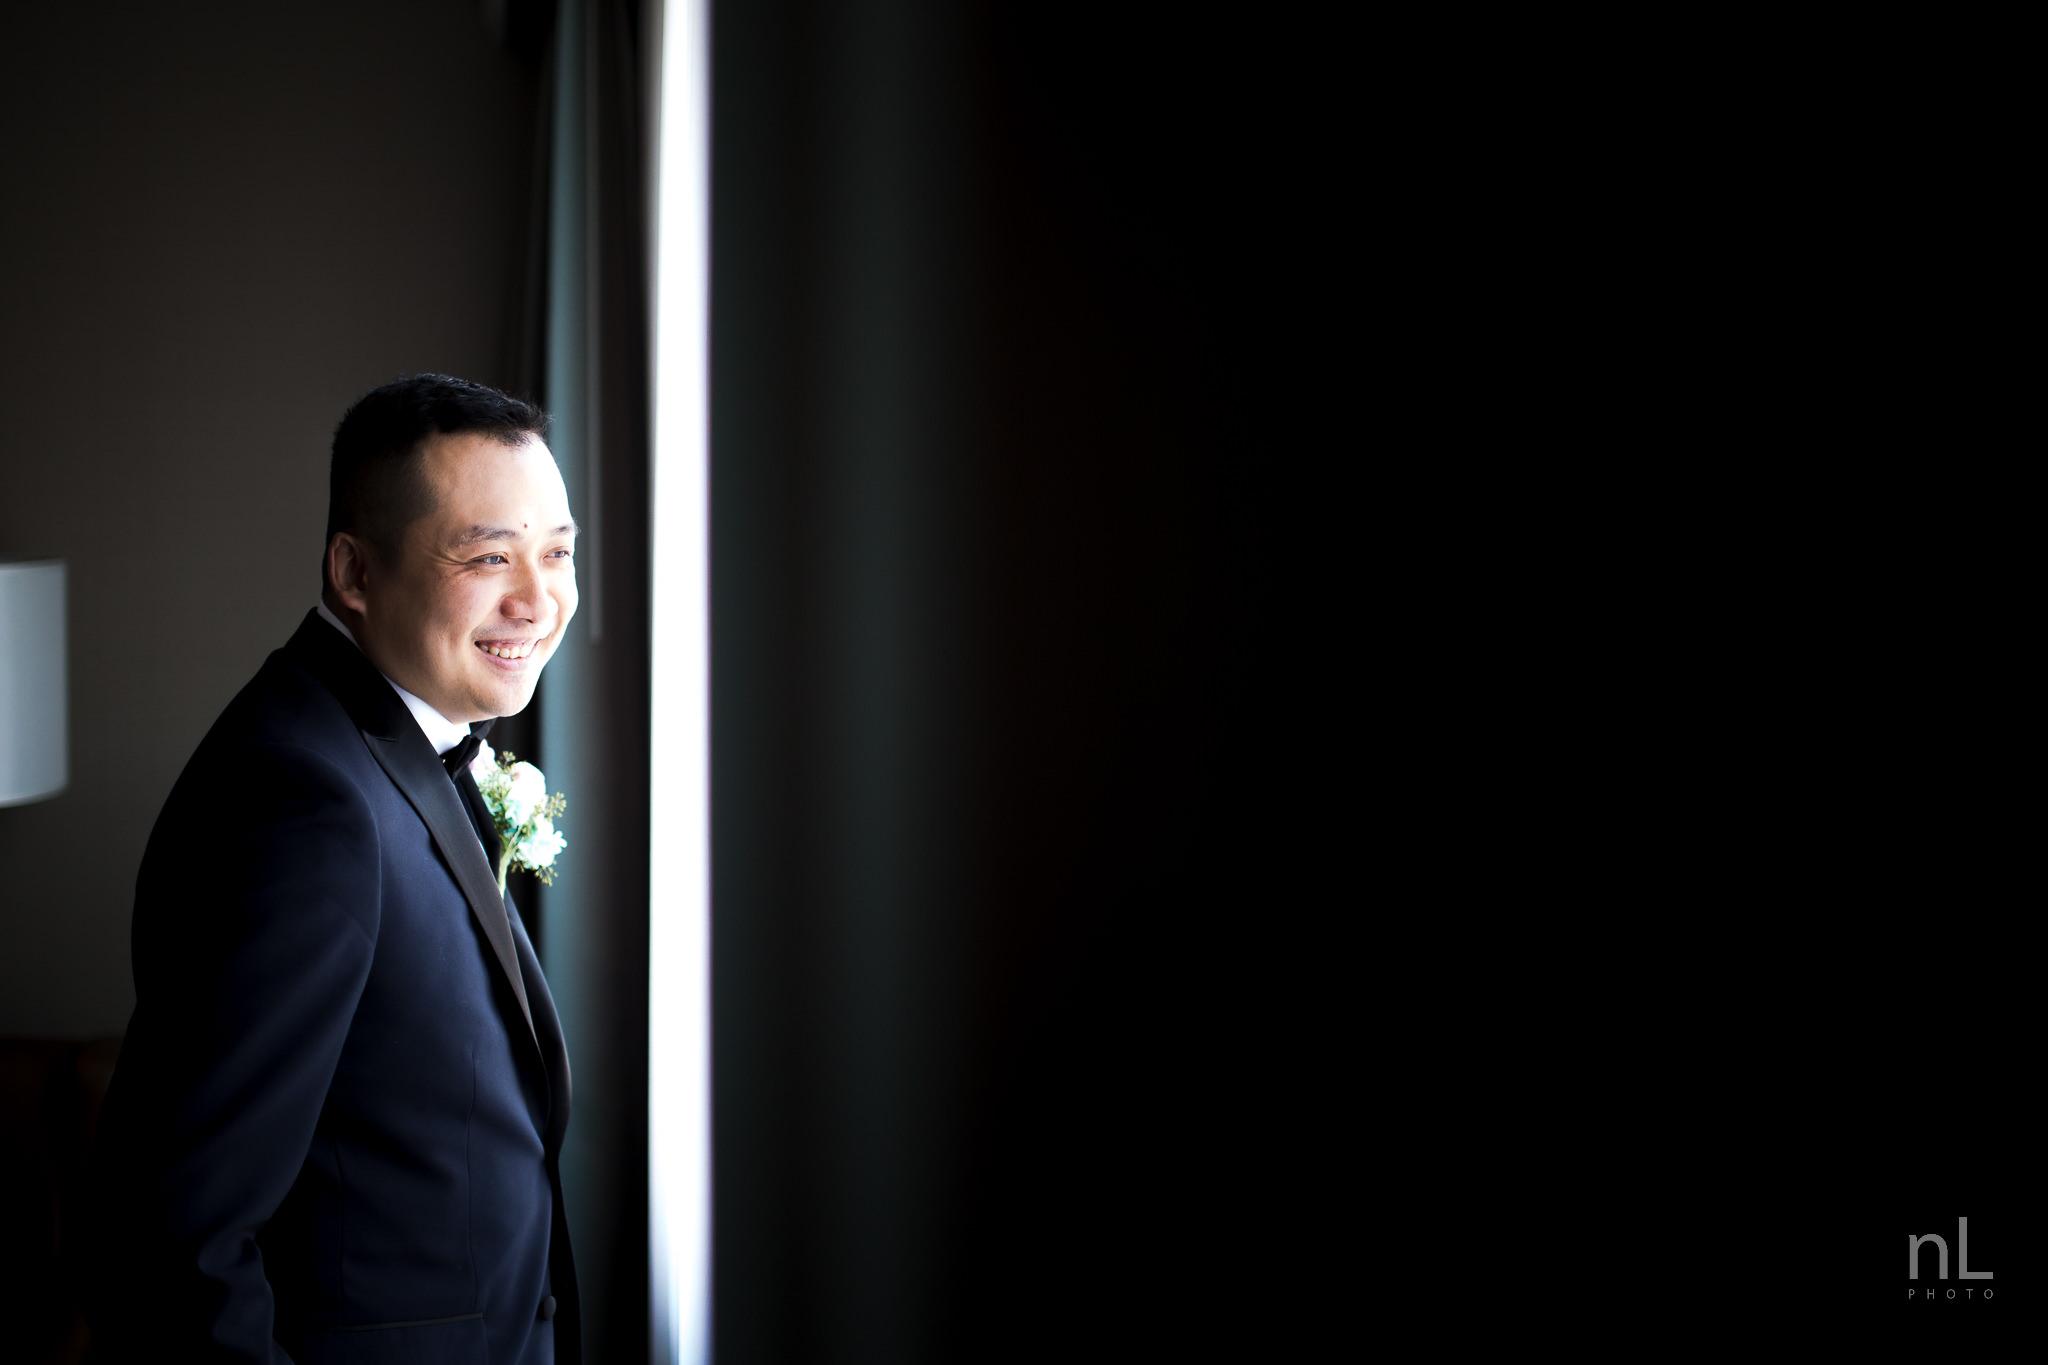 nick-lie-photography-los-angeles-wedding-photographer-5.jpg